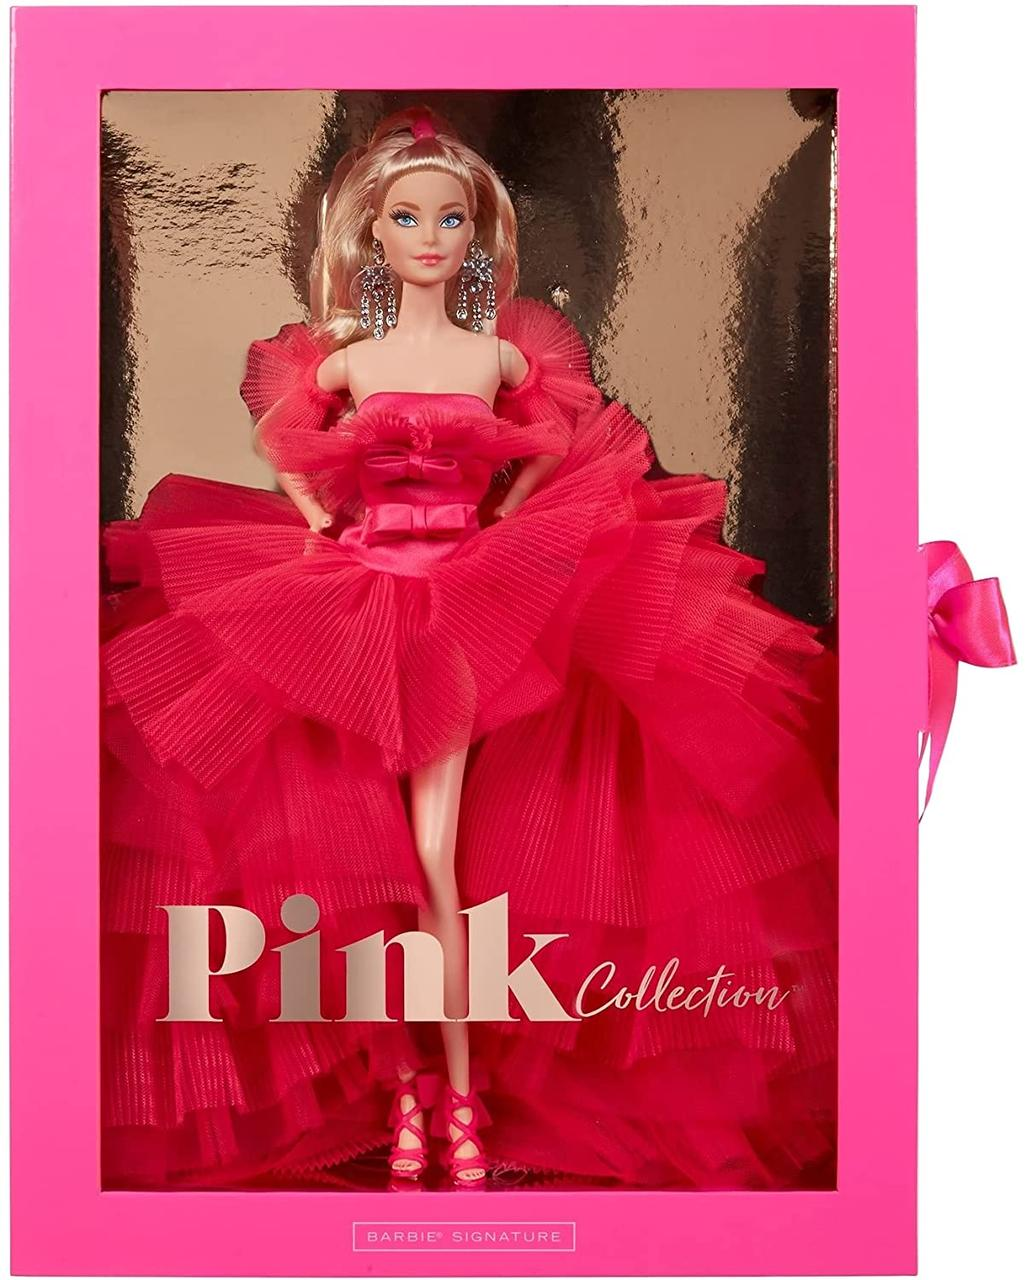 Колекційна лялька Барбі Рожева колекція Barbie Signature Silkstone Pink Collection Pink Premiere GTJ76